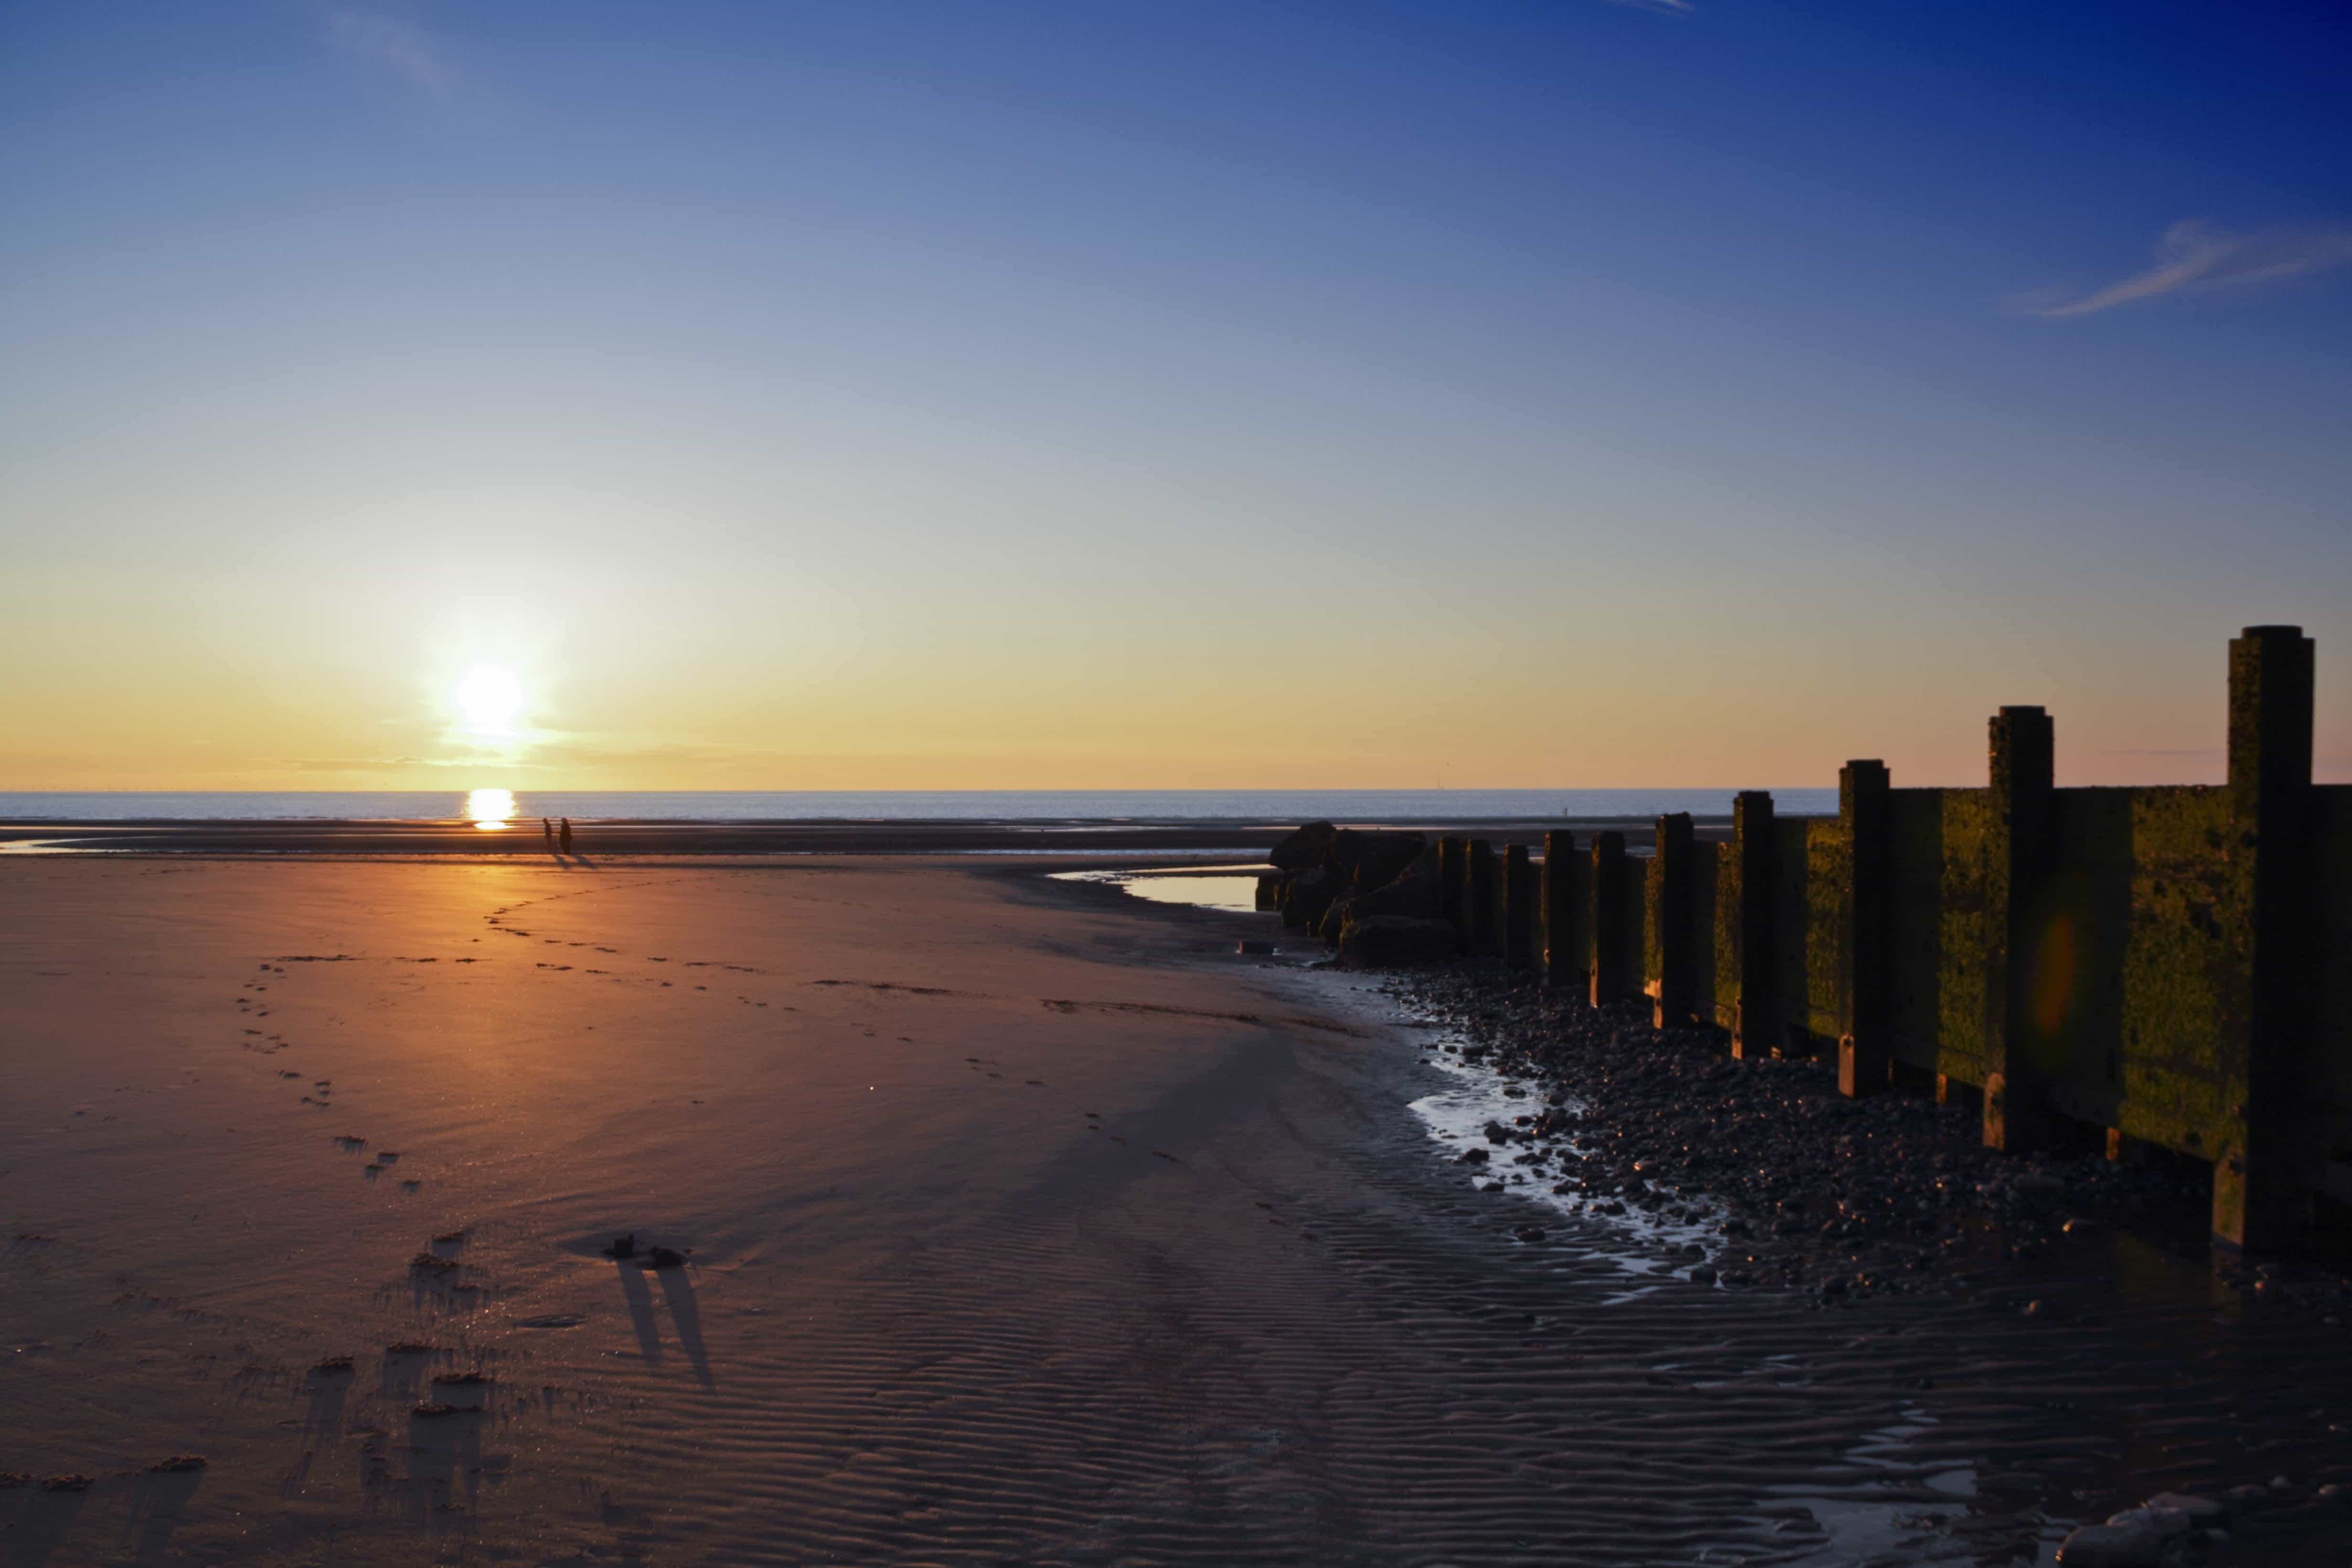 Scenery Wallpaper Hd Free Download Free Picture Sunrise Silhouette Water Beach Sea Dawn